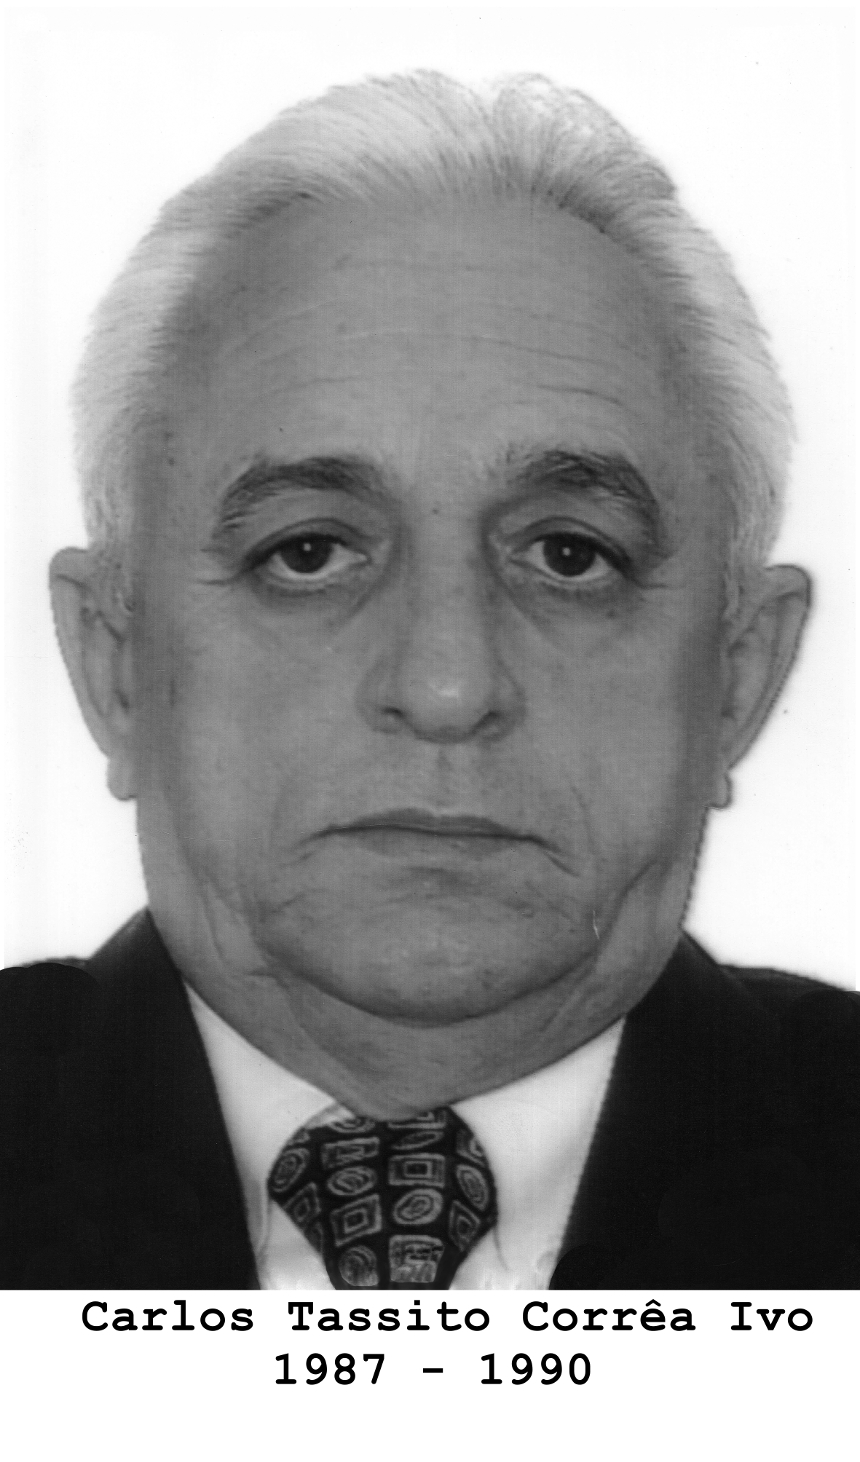 Carlos Tassito Corrêa Ivo 1987 - 1990